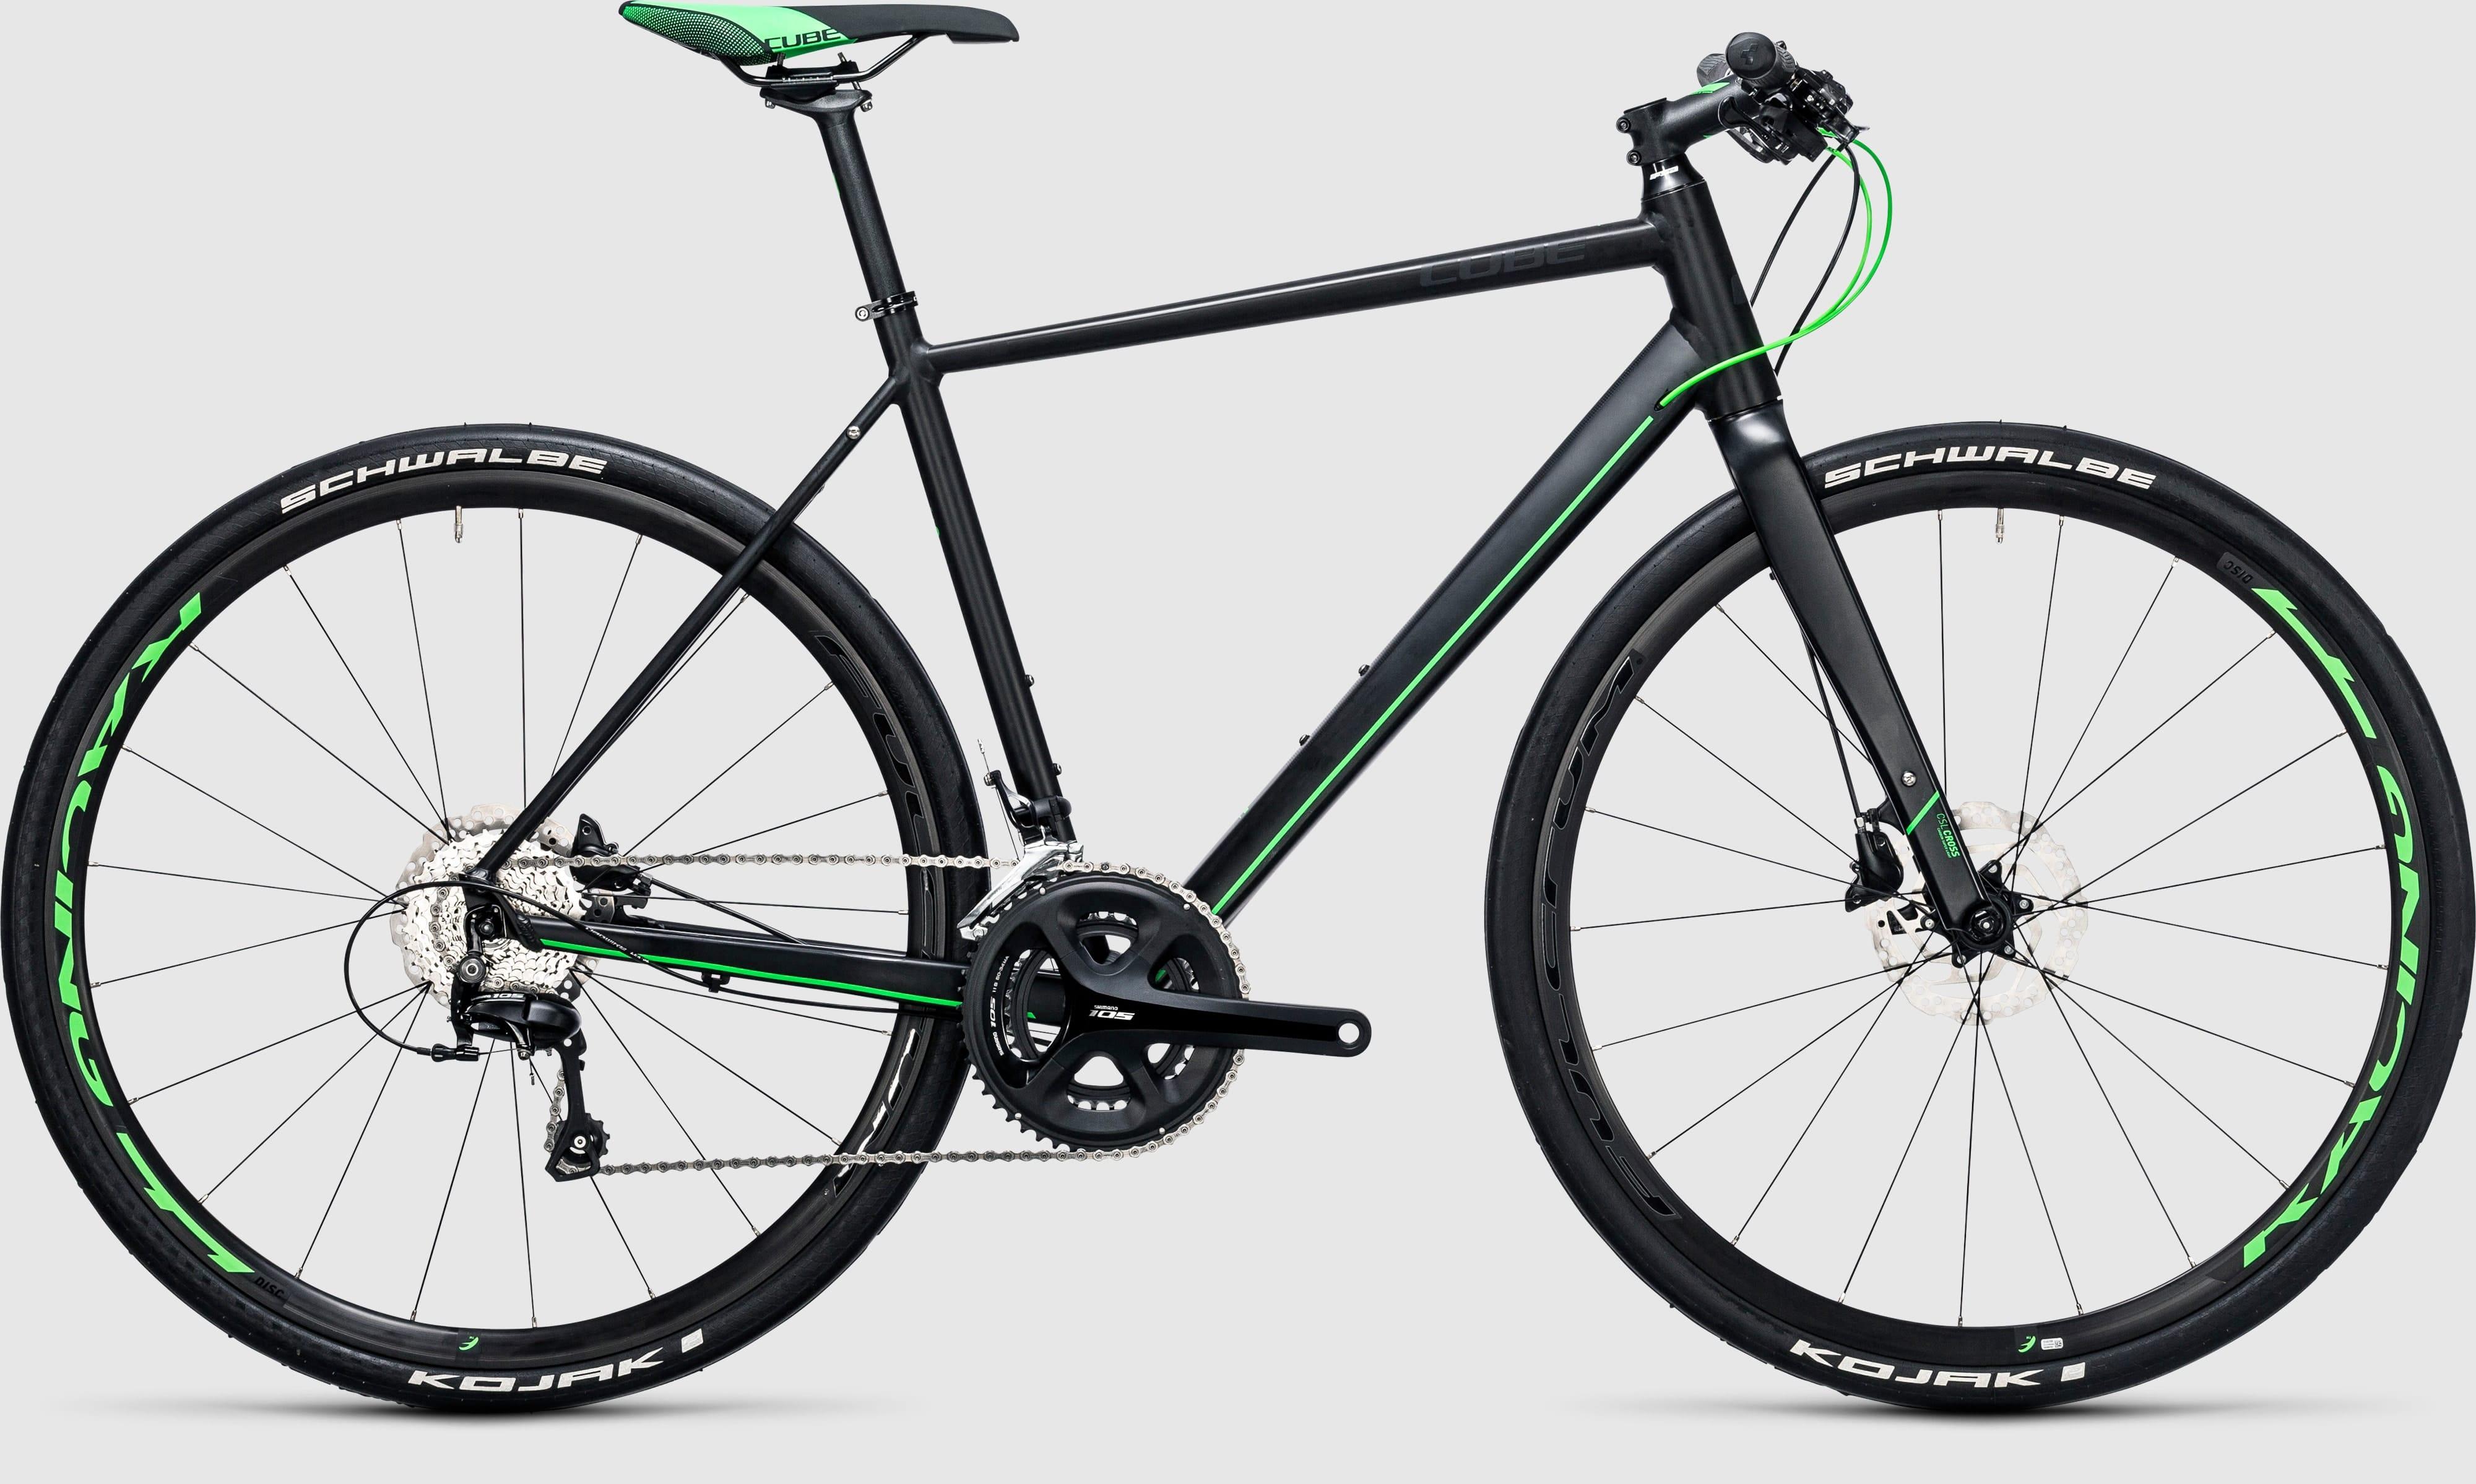 Cube Sl Road Race Bike 2017 All Terrain Cycles